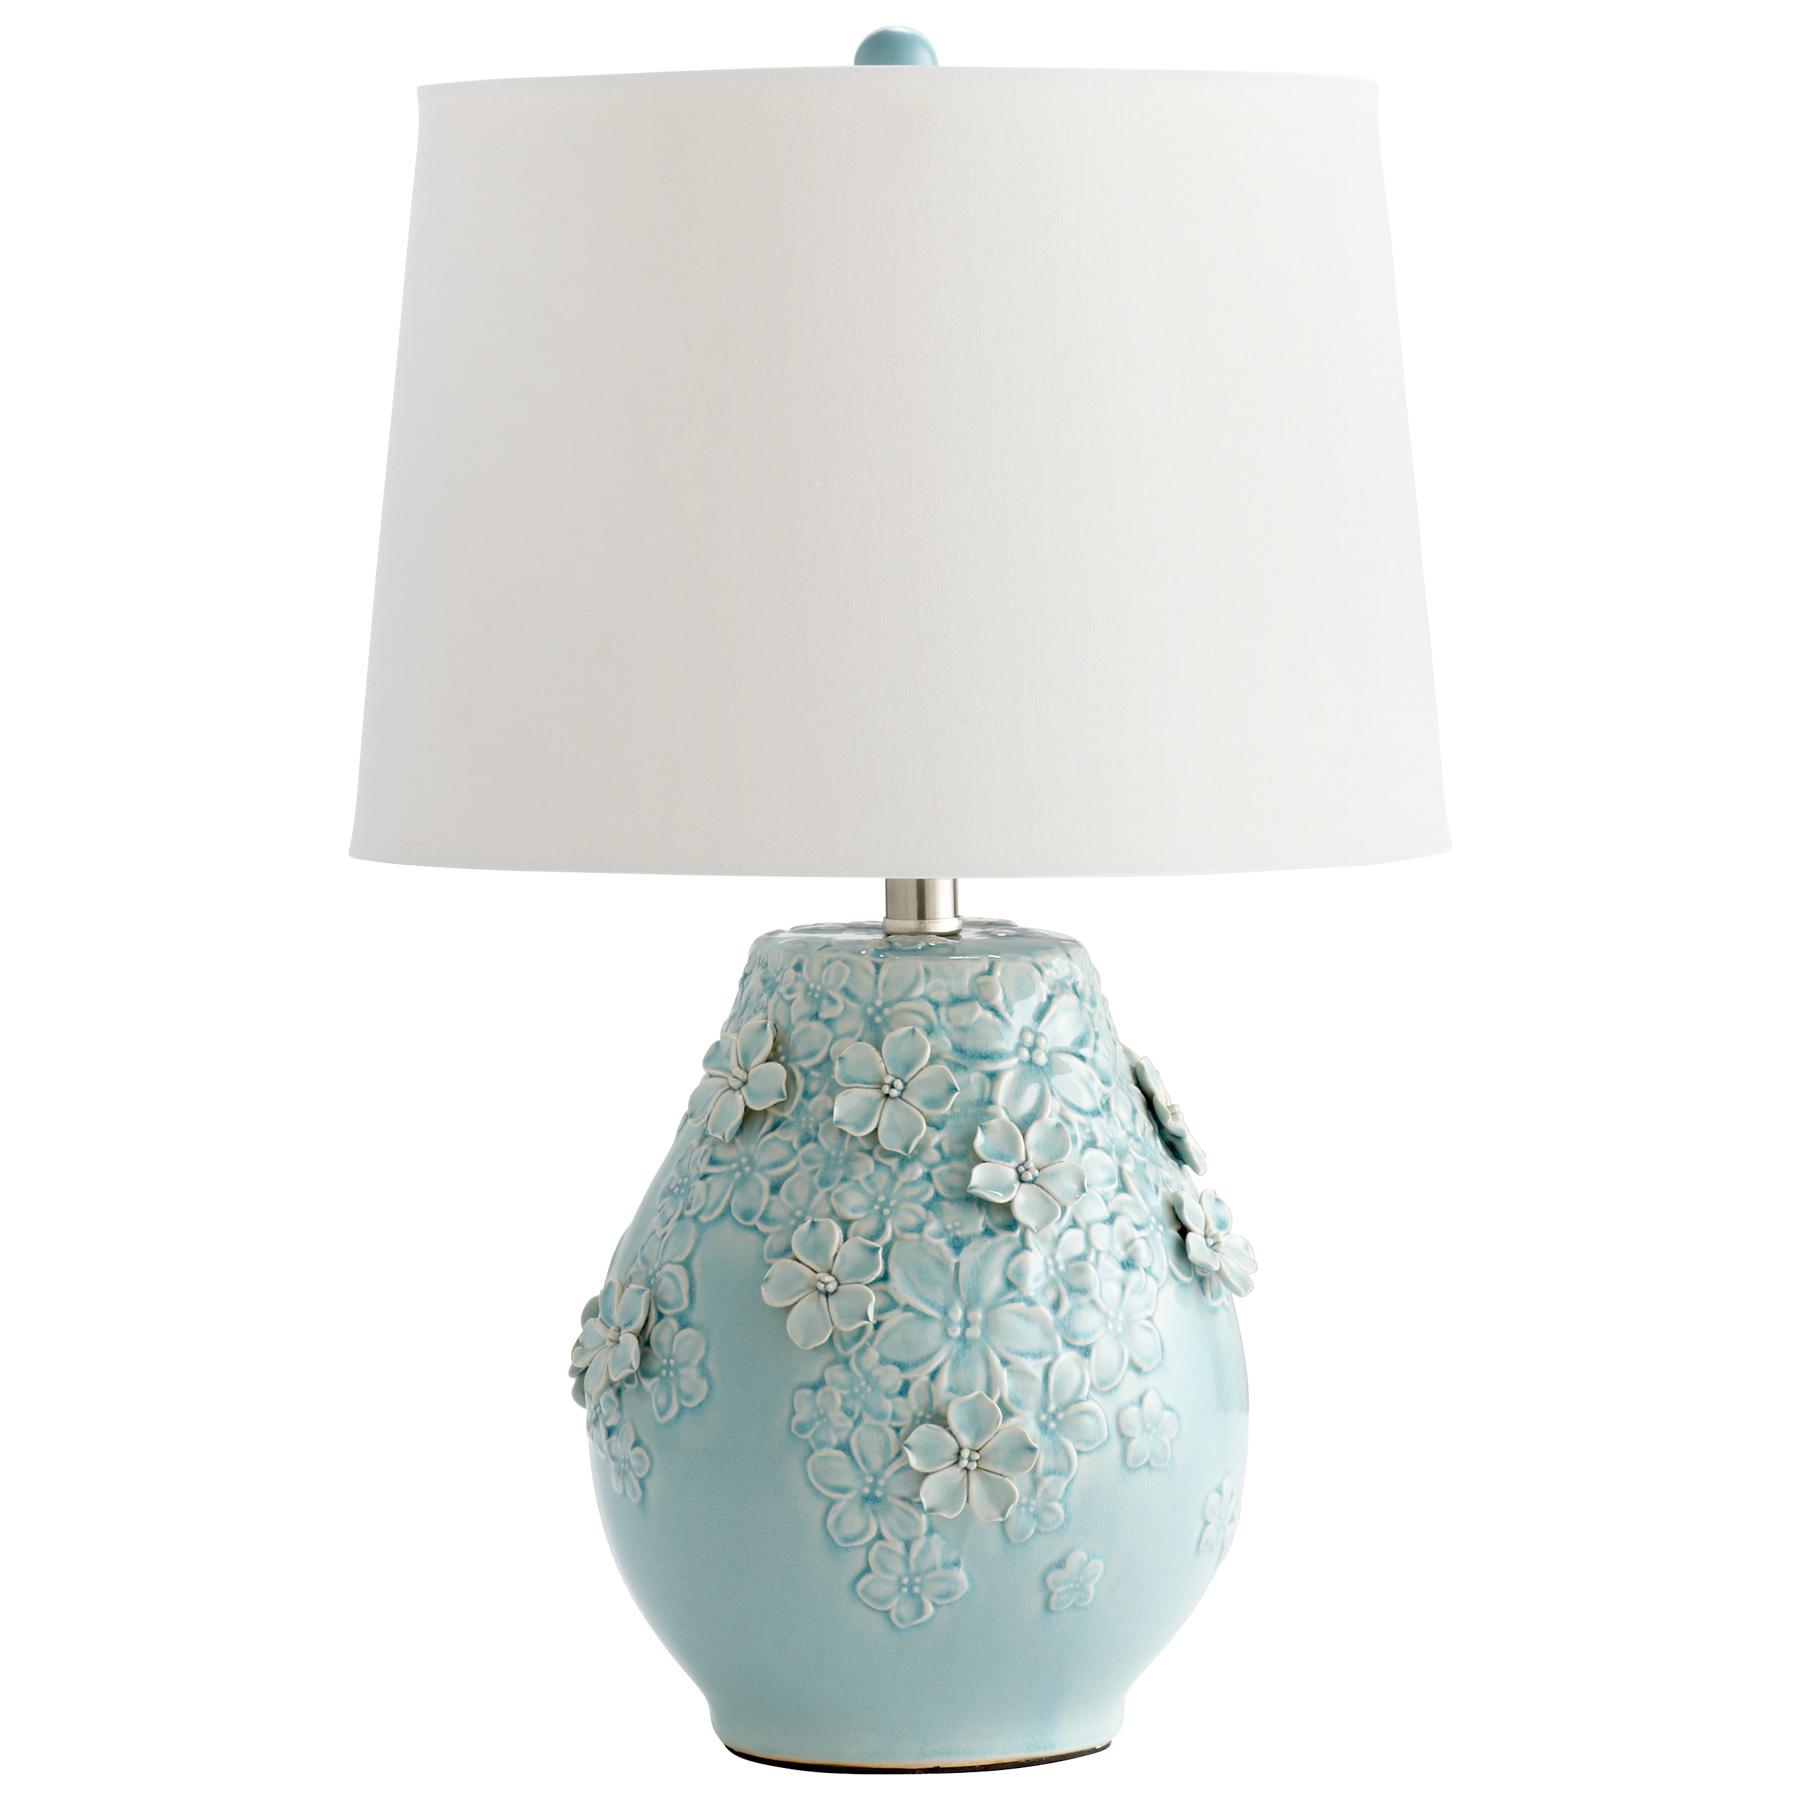 Sky Blue Table Lamp